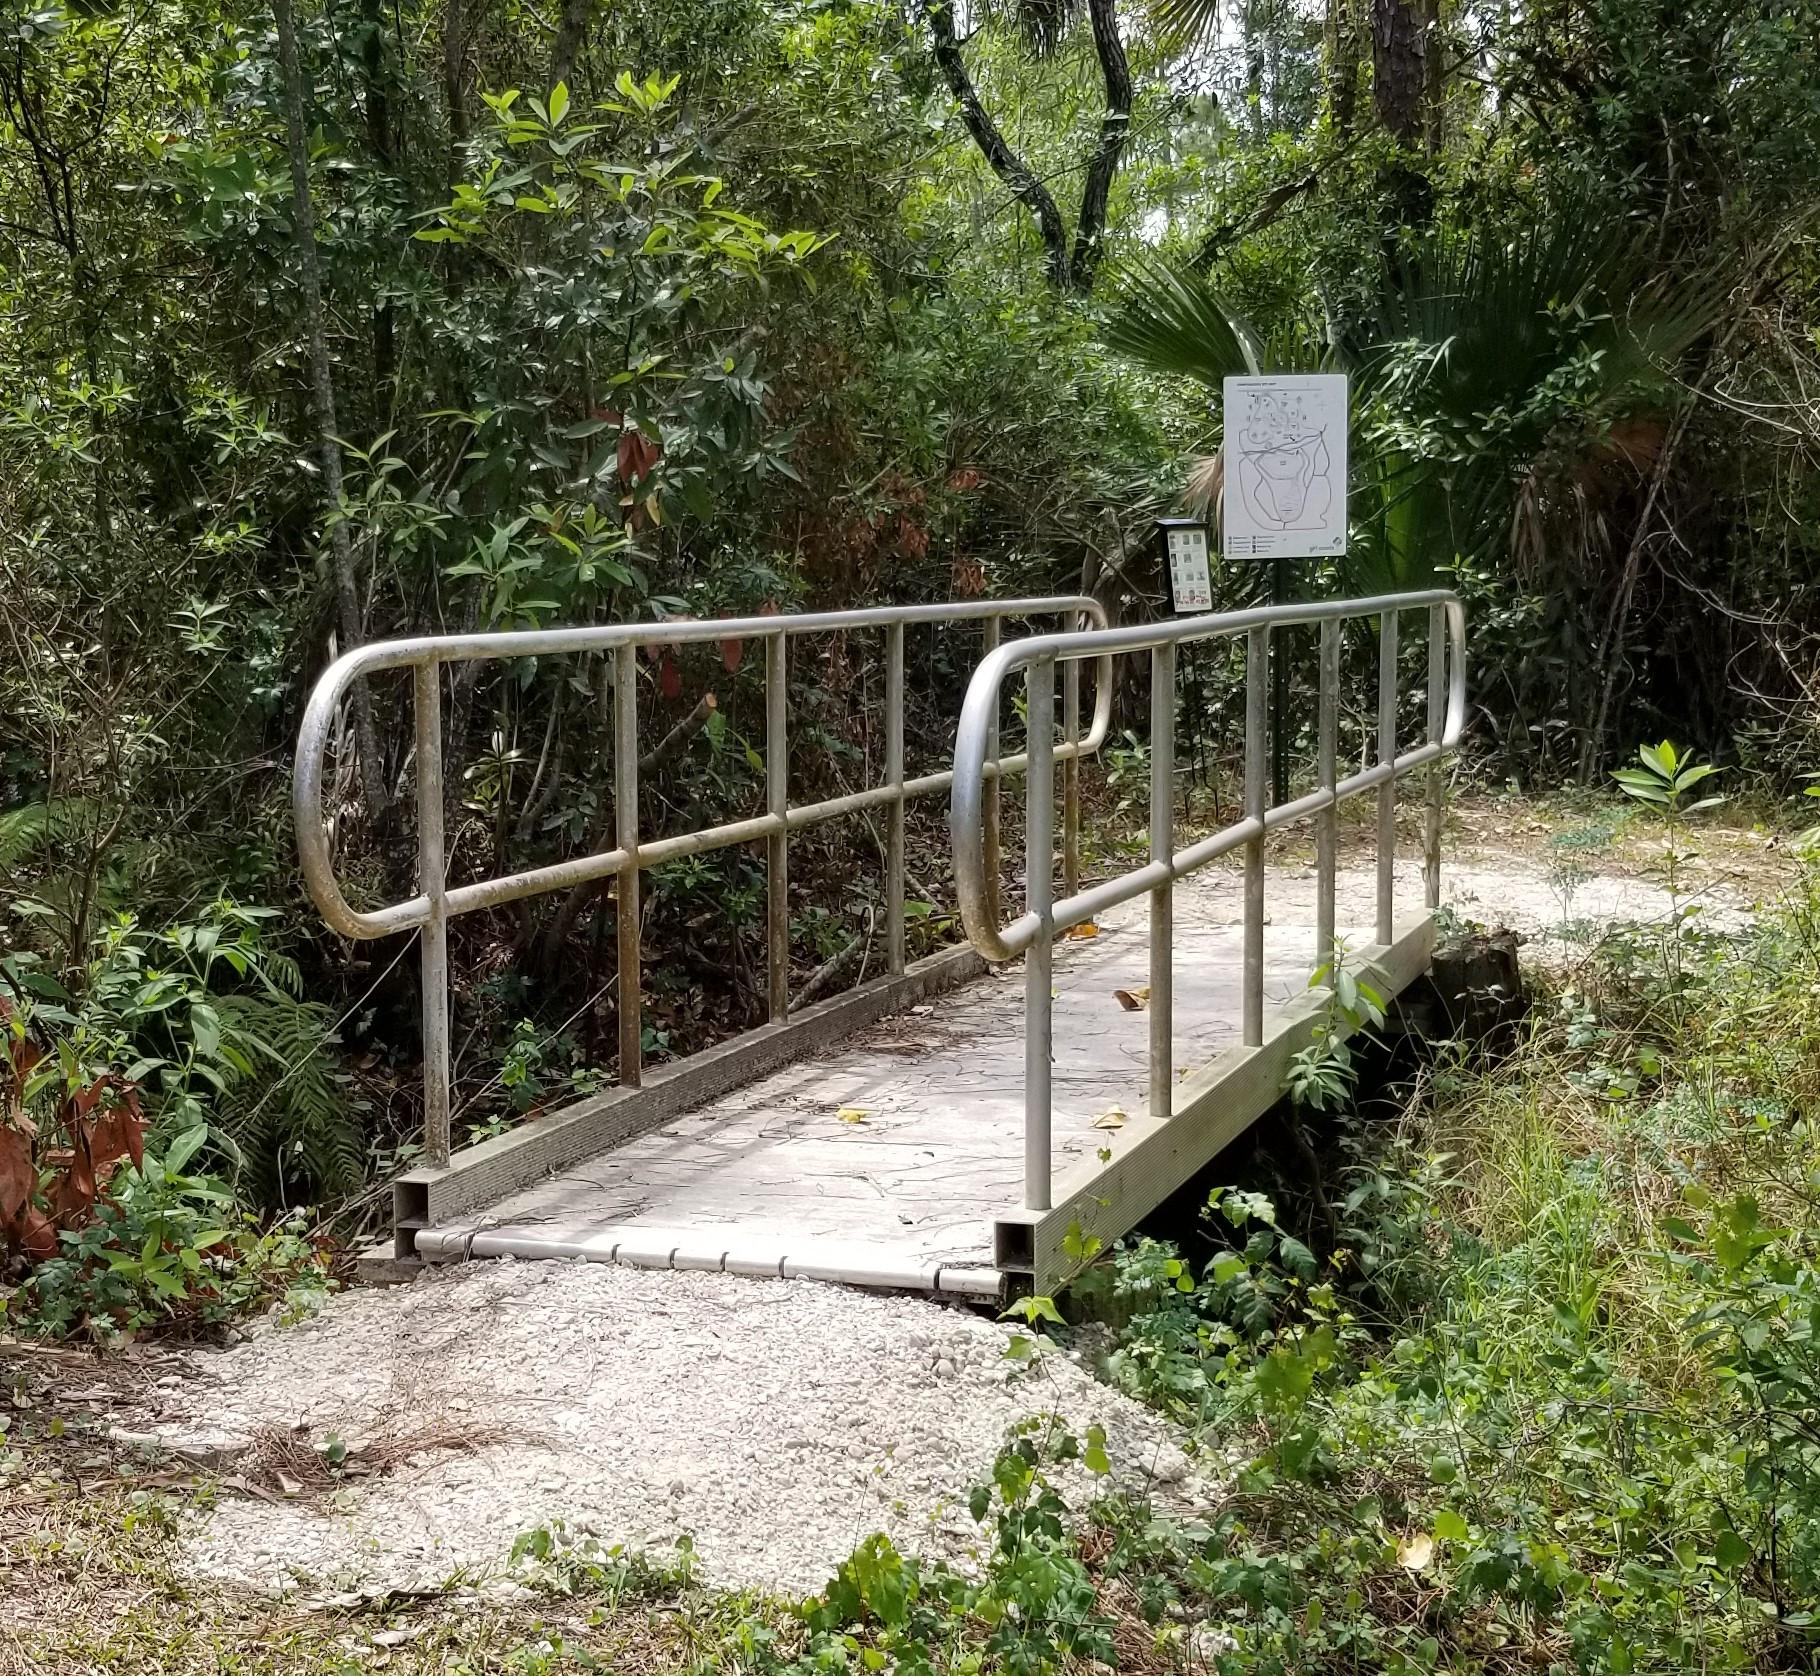 Bridge stabalized